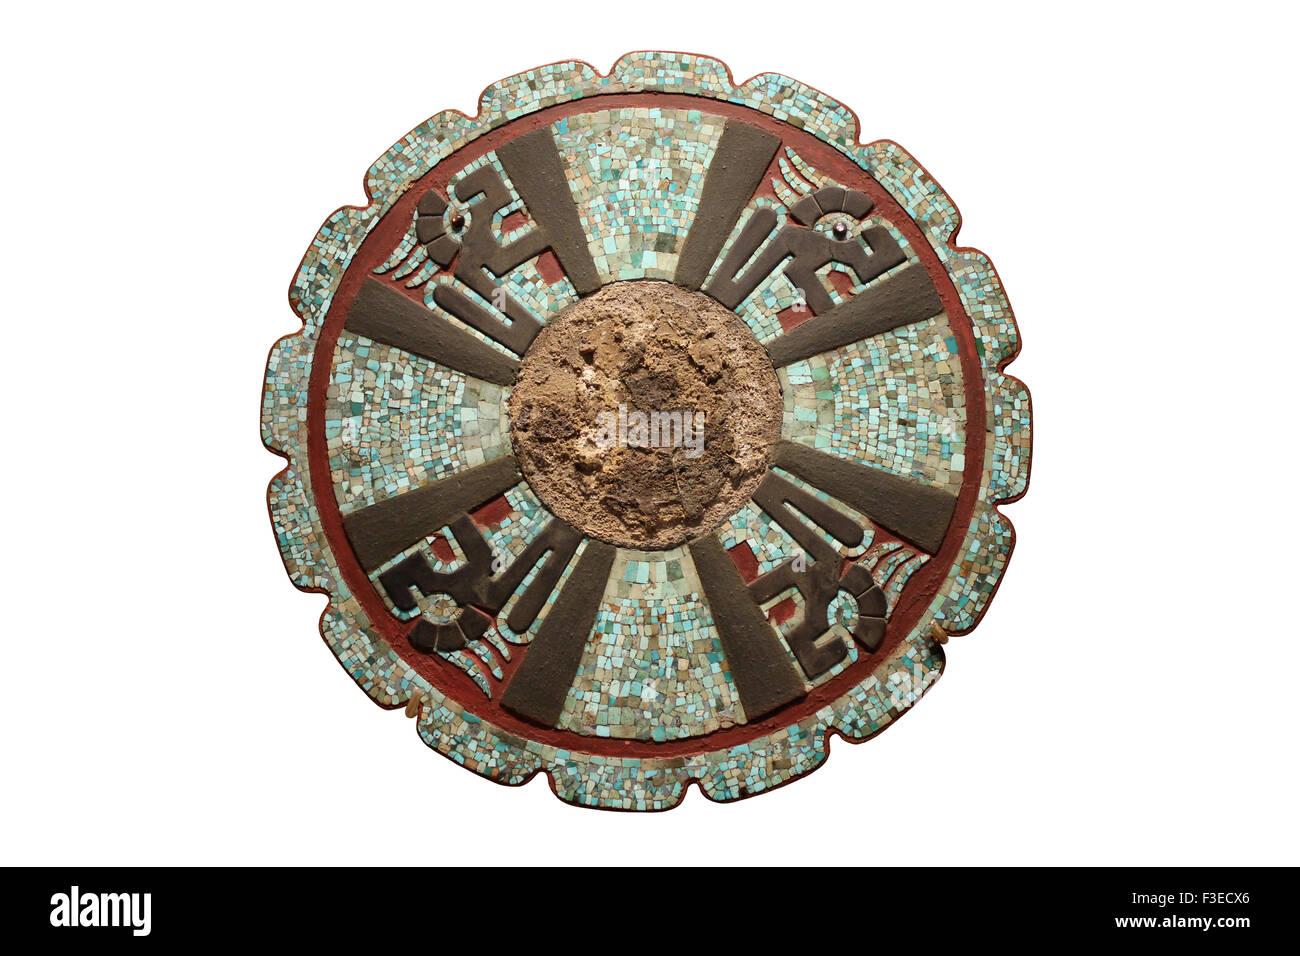 Disc From Chichen Itza, Yucutan, Mexico - Stock Image